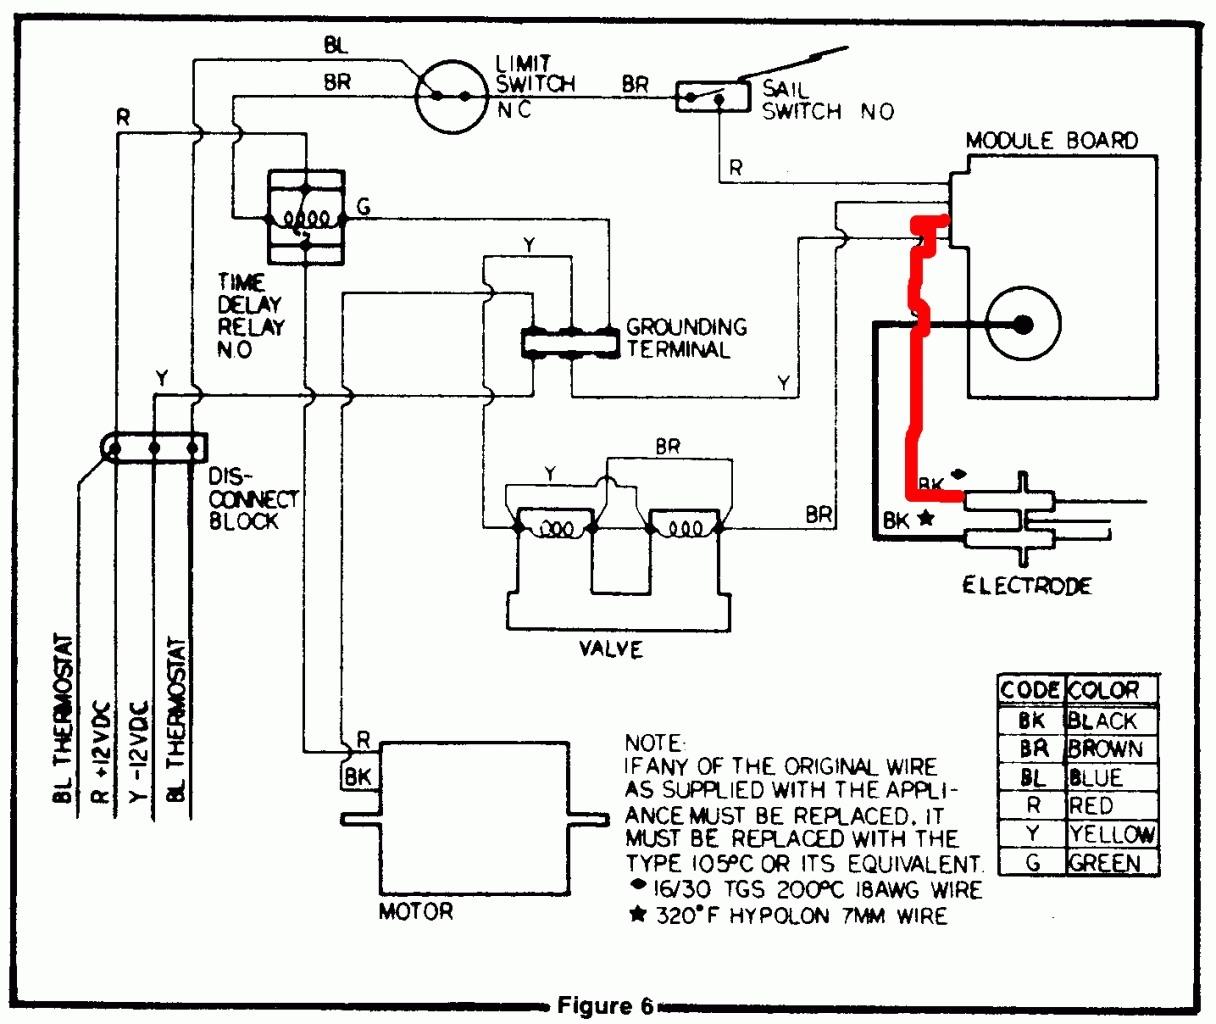 ingintion switch 1994 club car wiring diagram